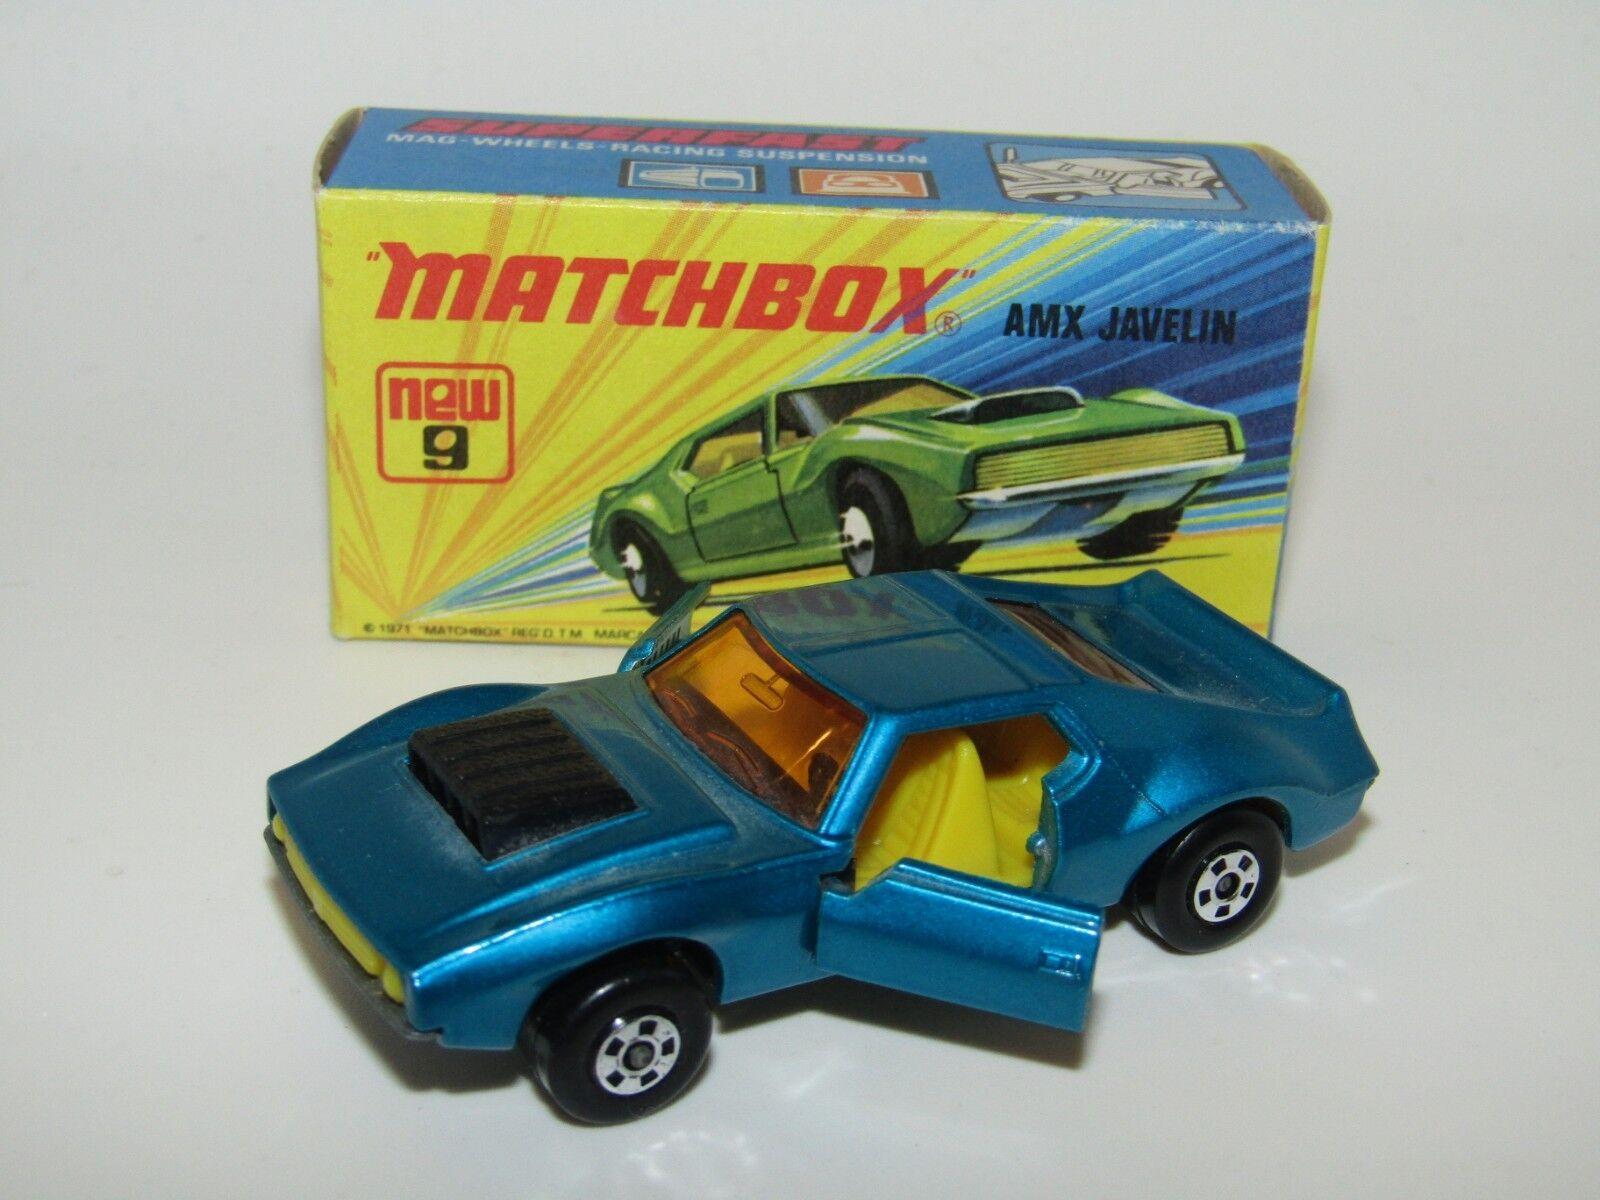 MATCHBOX SUPERFAST Nº 9 AMX Javelin LT rencontré bleu doors Open LT Yell int En parfait état, dans sa boîte RARE